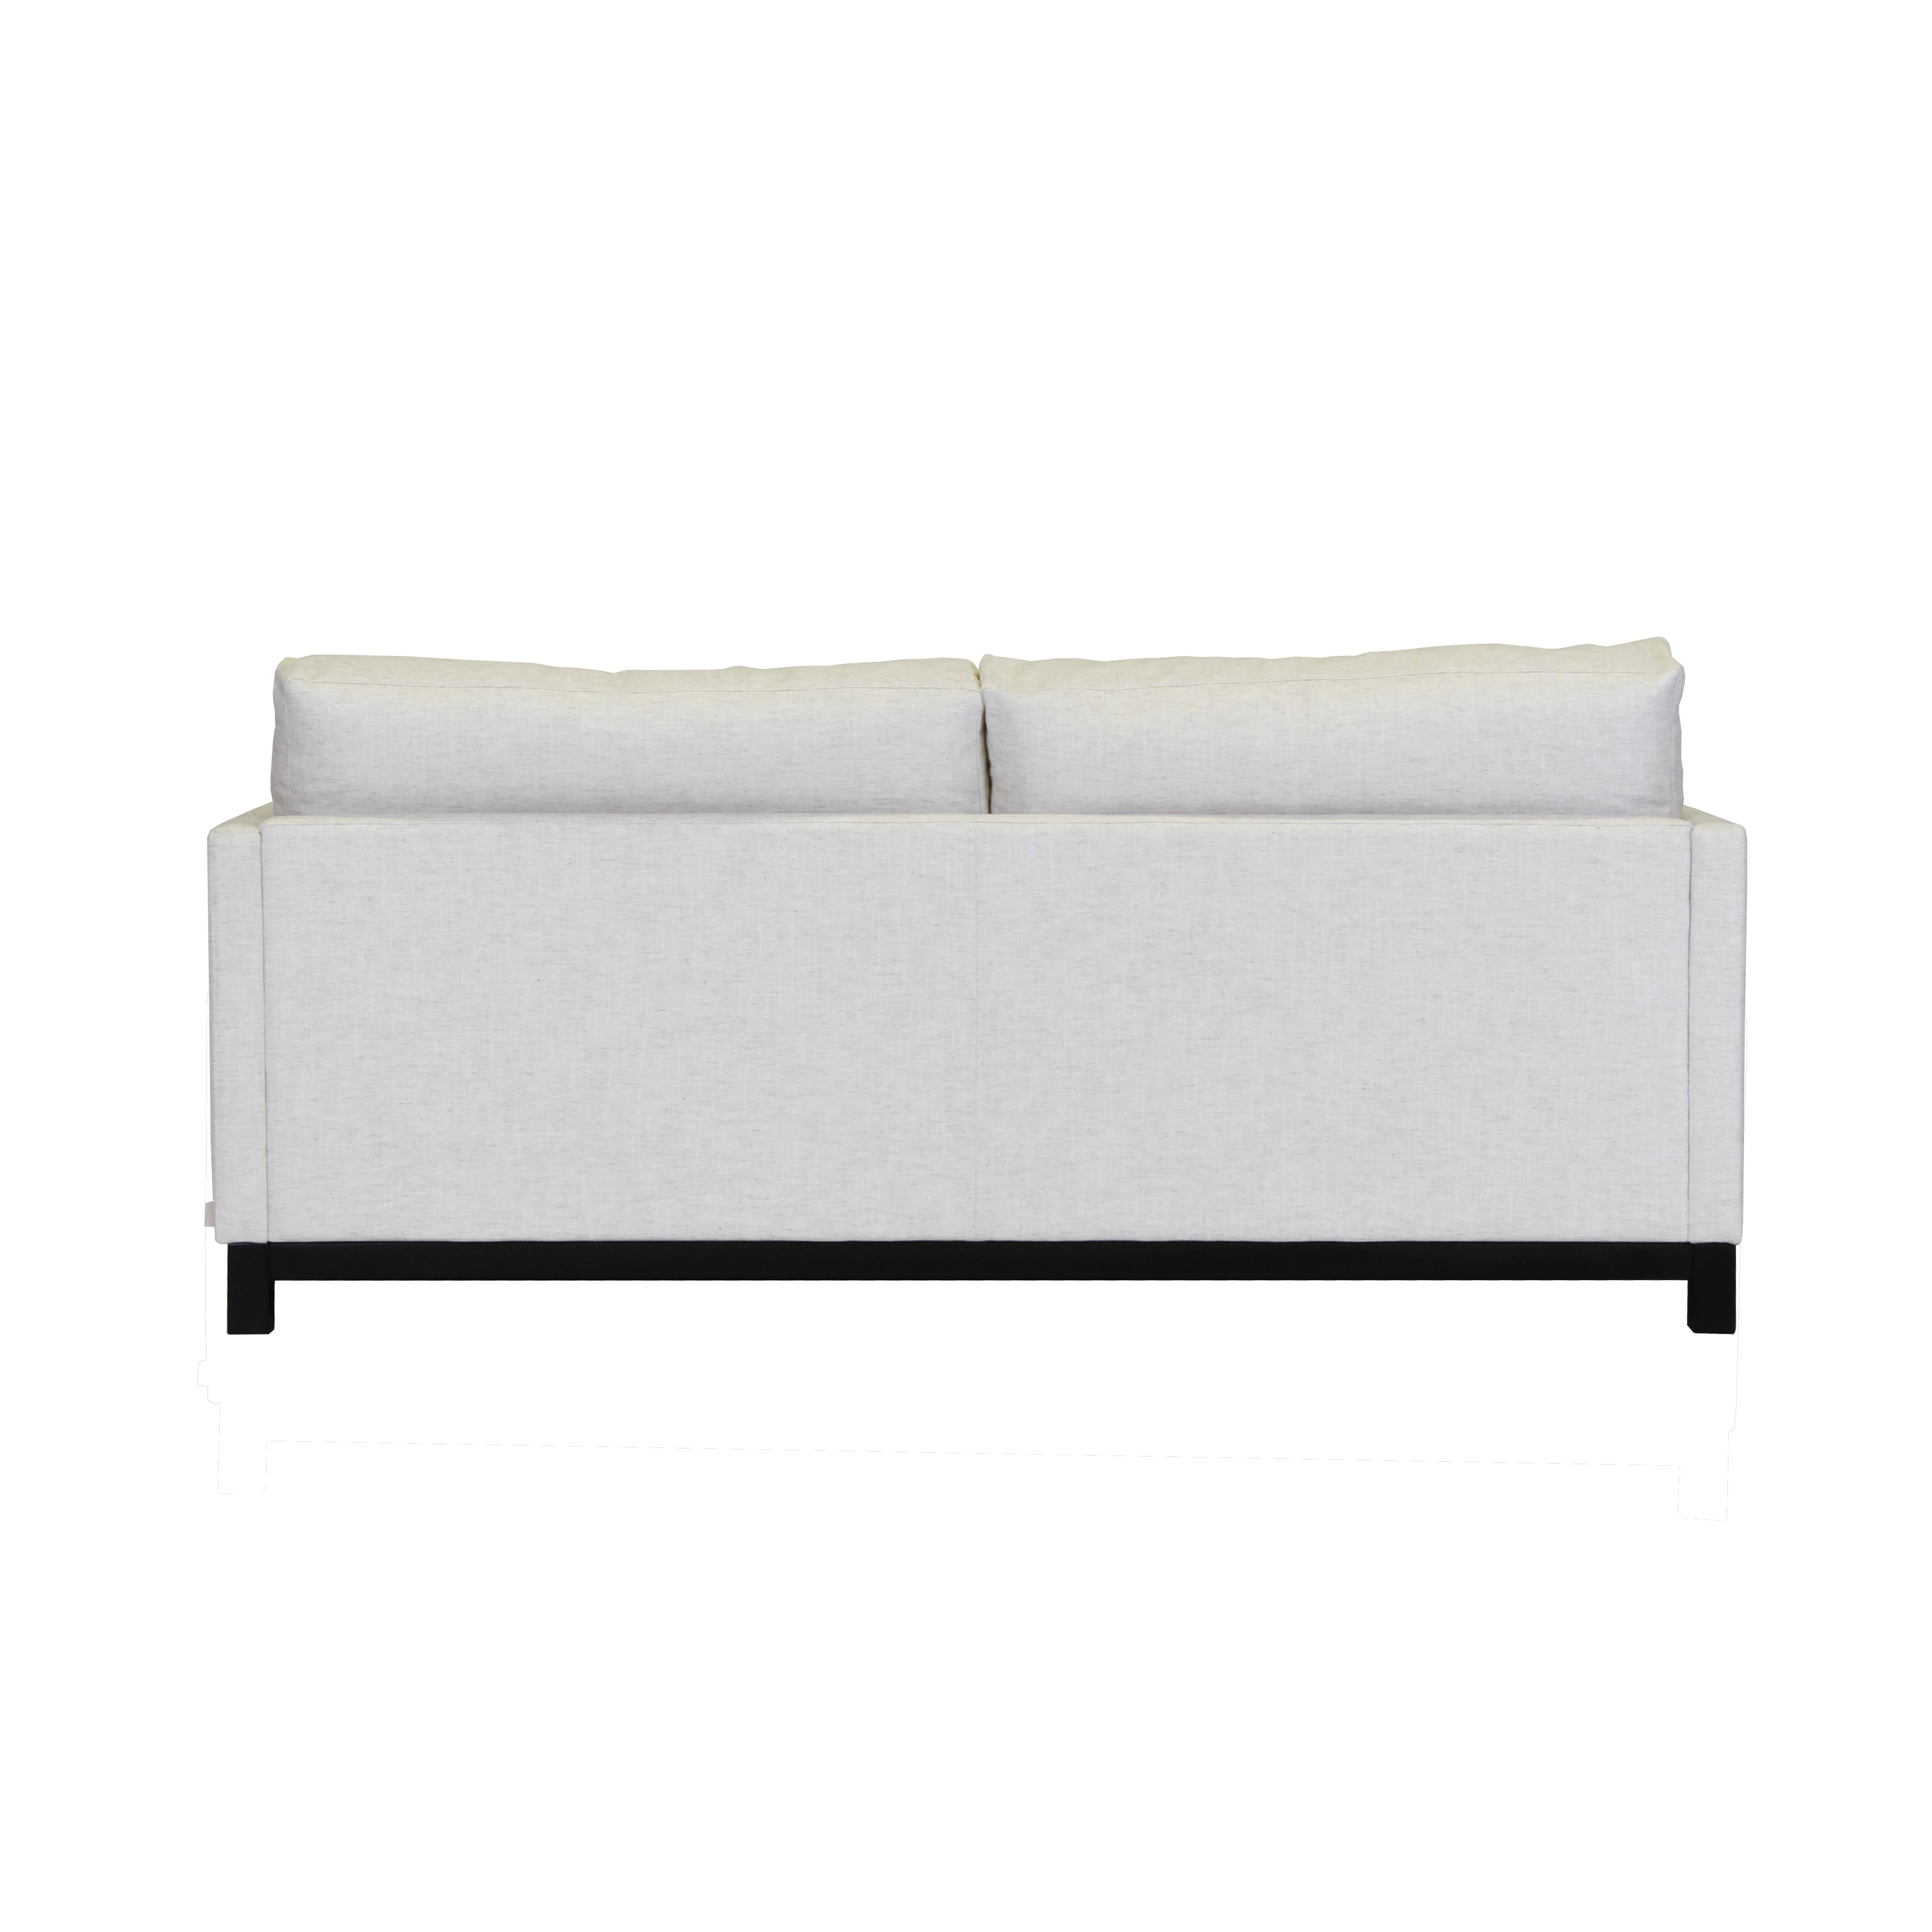 Somerville soffa 3-sits bakifrån - englesson.se